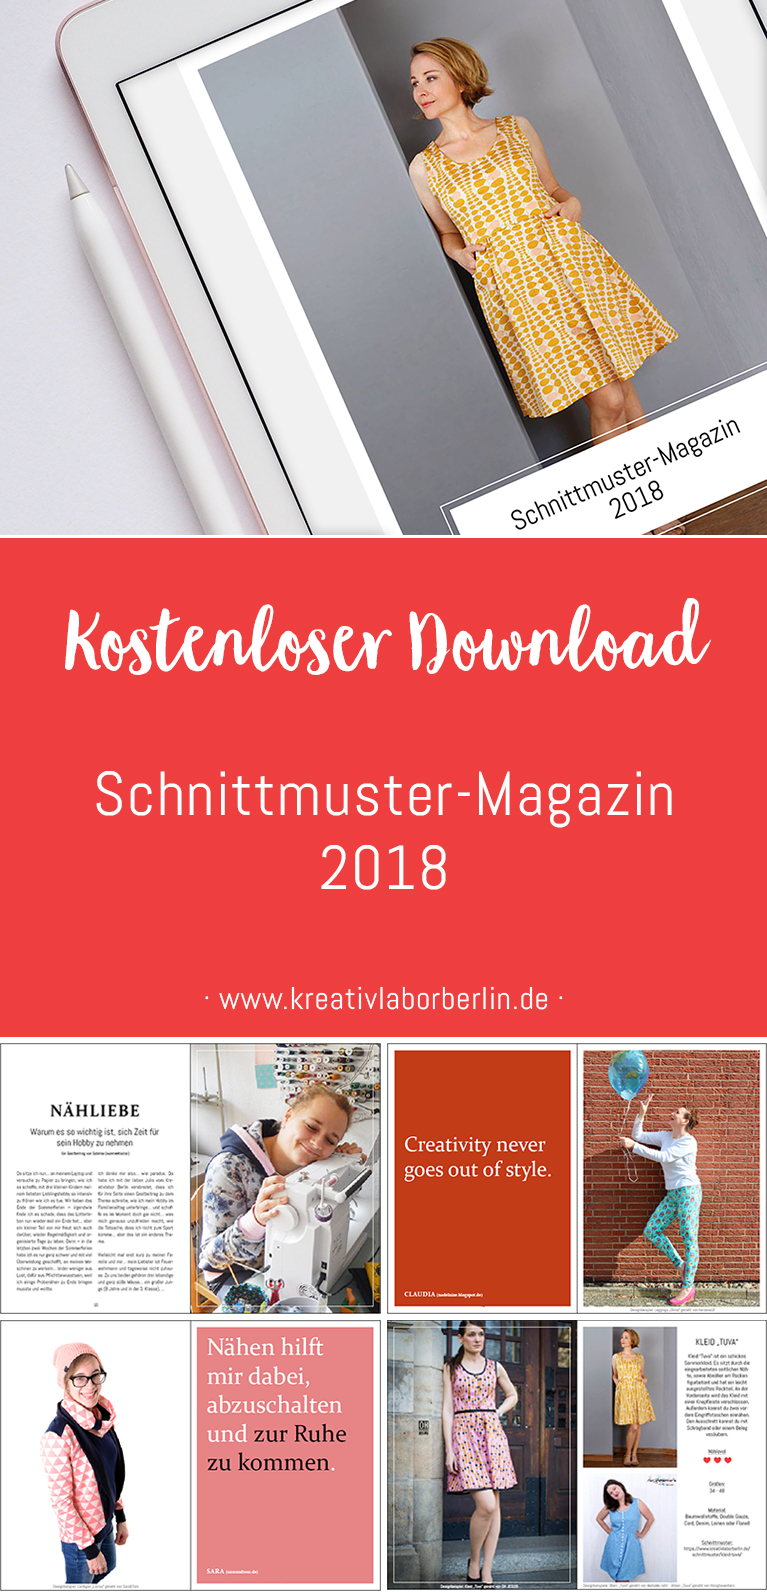 Das neue Schnittmuster-Magazin ist da! | Kreativlabor Berlin